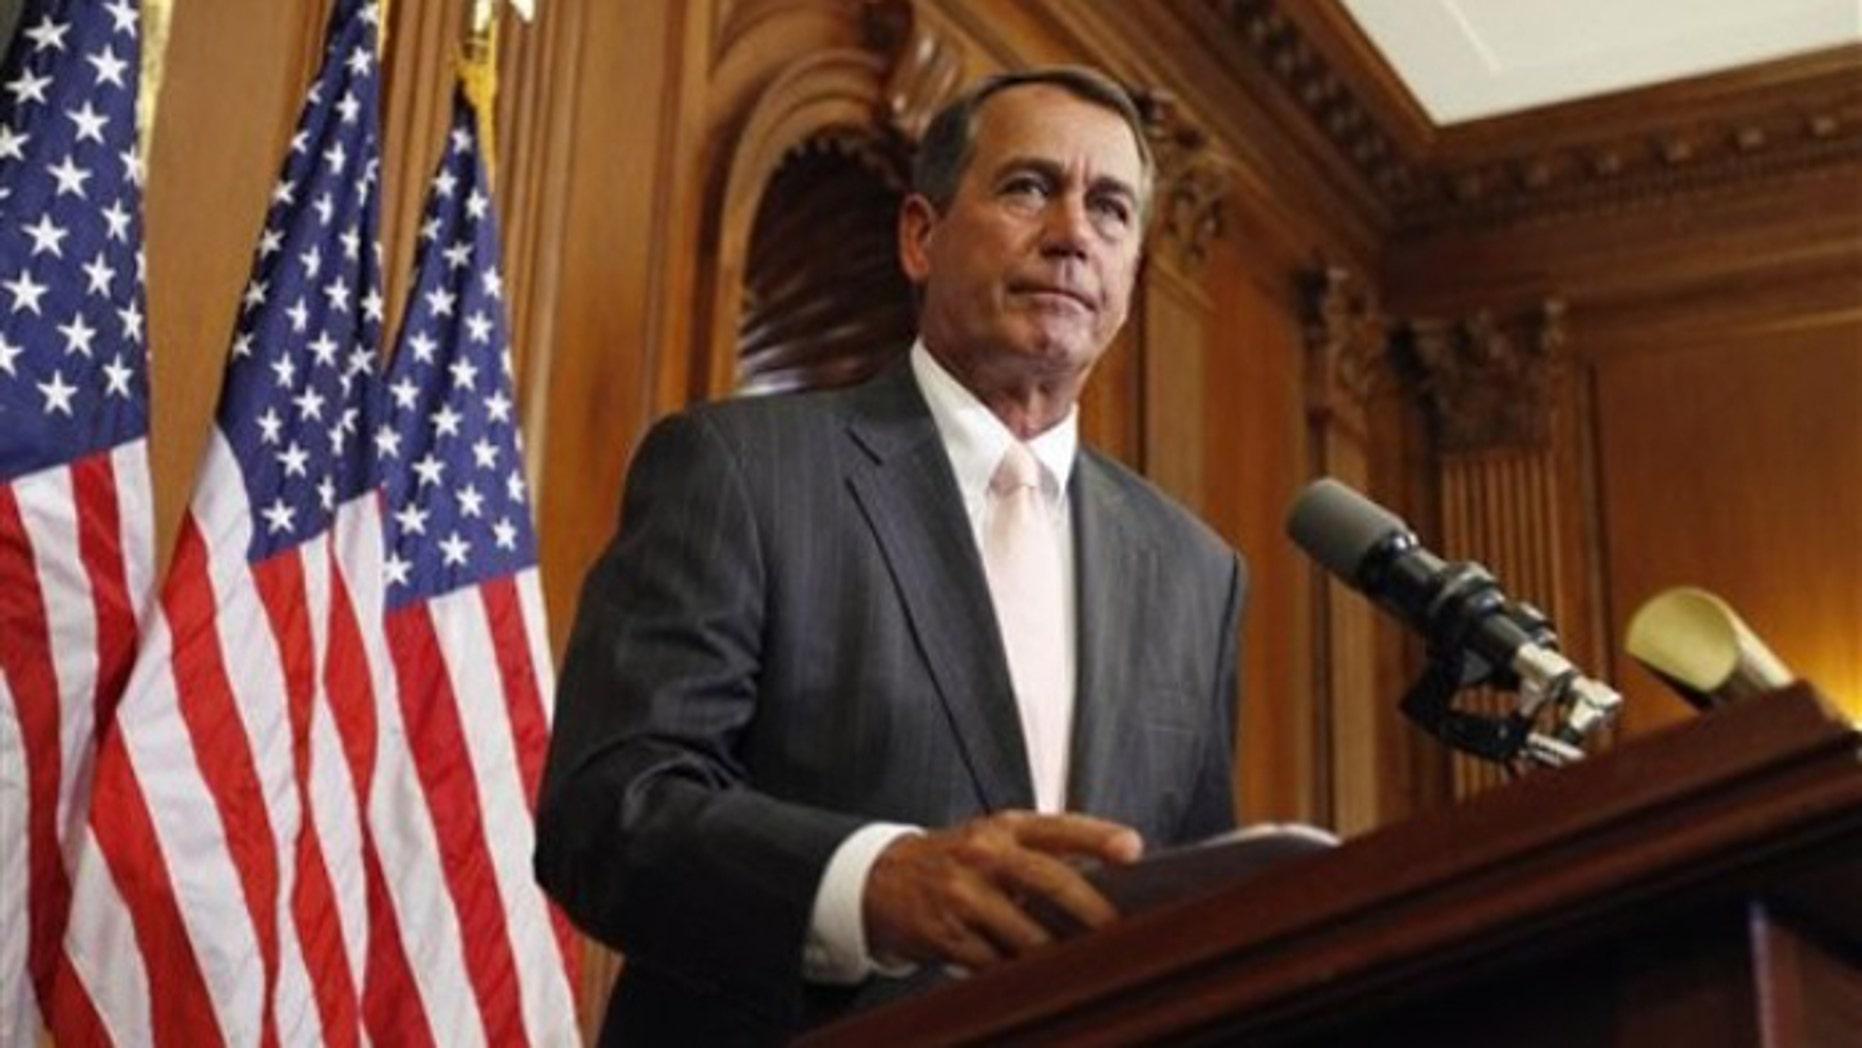 House Republican Leader John Boehner speaks June 16 on Capitol Hill in Washington. (AP Photo)